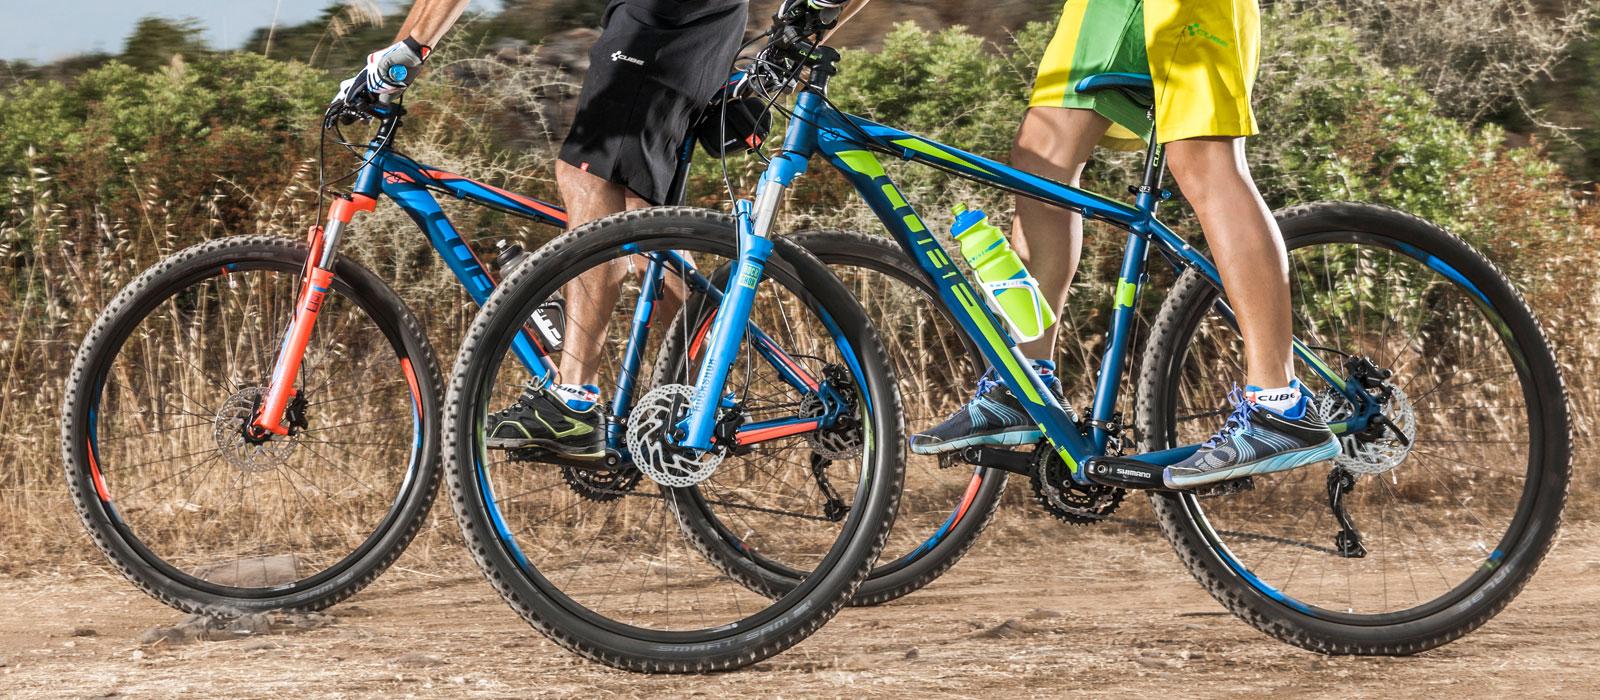 njustudio_cube_bikes_2014_concept2